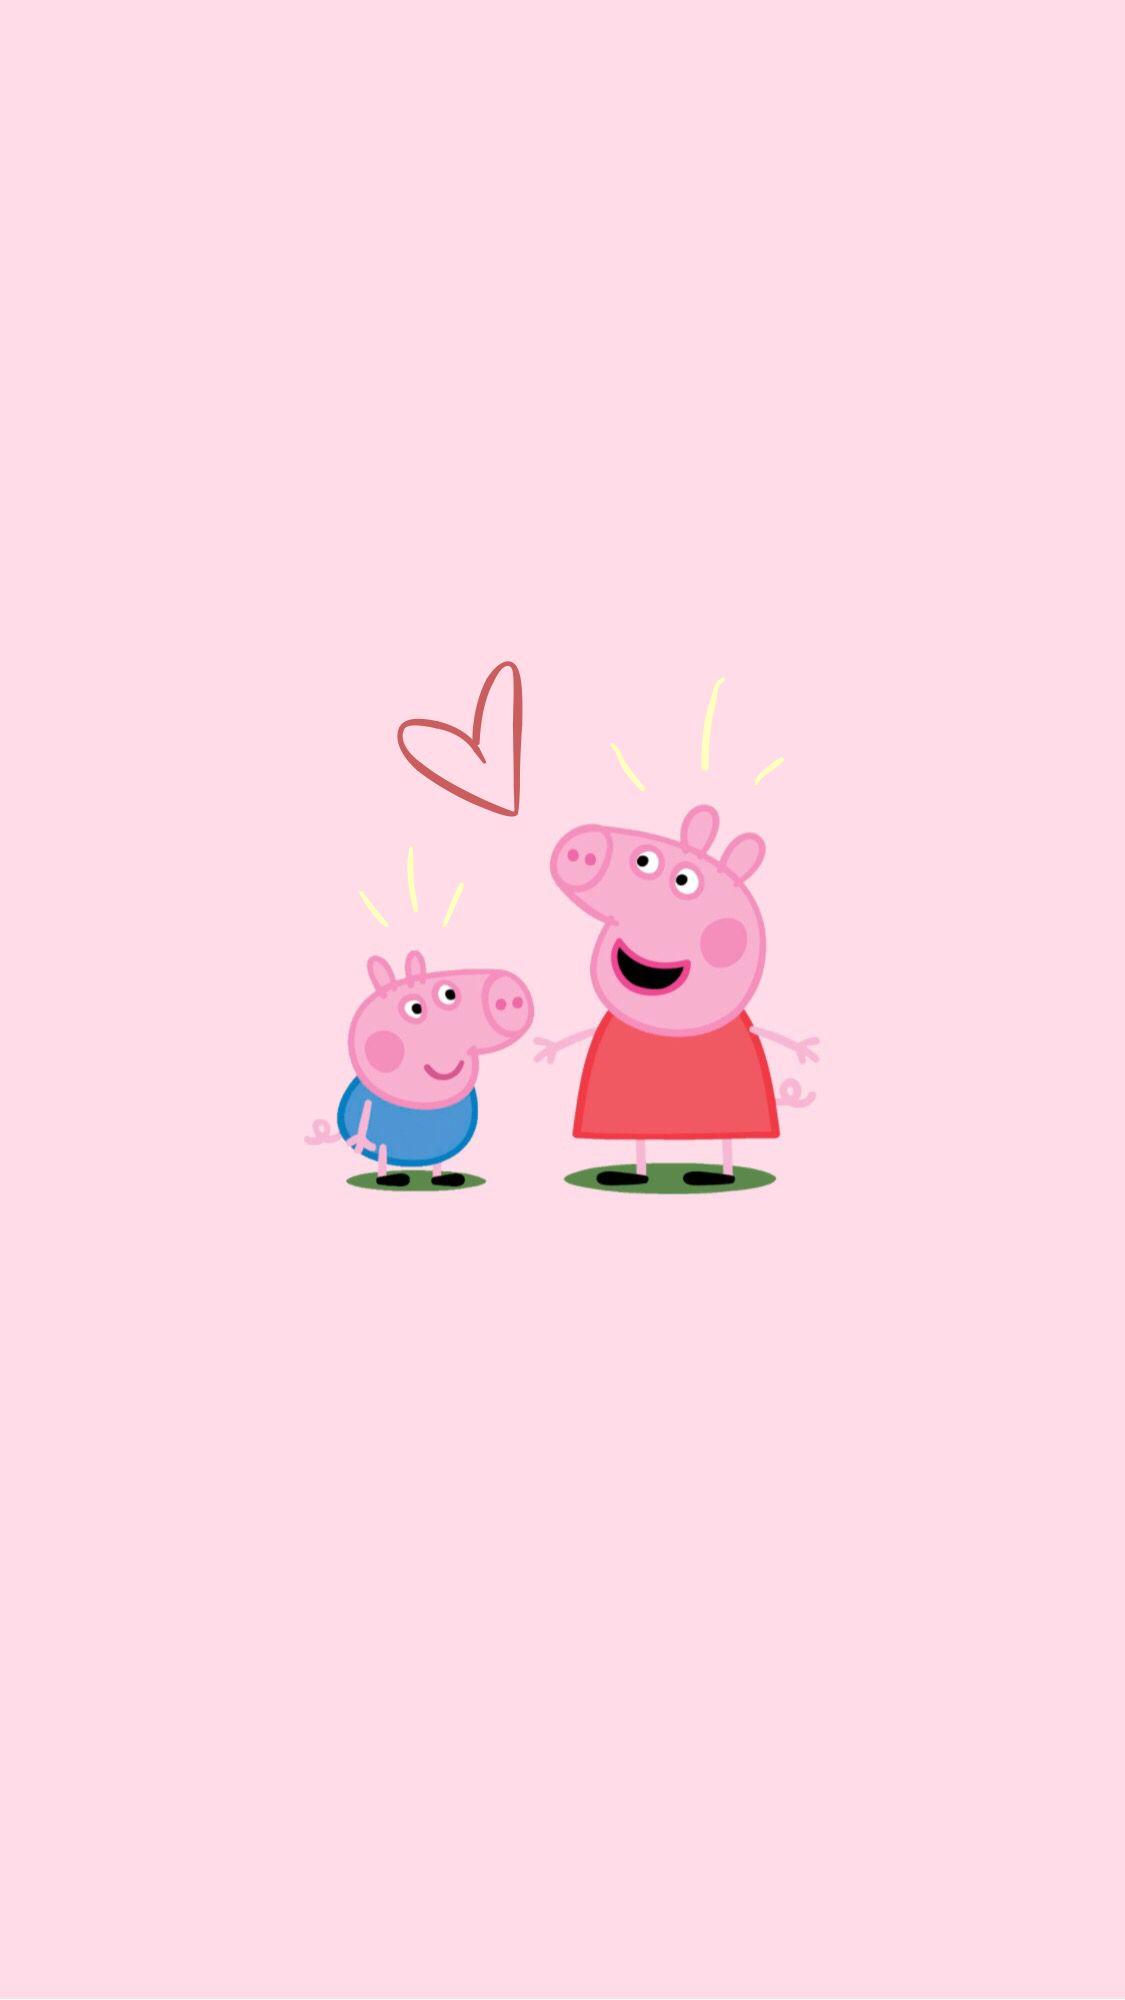 Peppa Pig Wallpaper Peppa Pig Wallpaper Pig Wallpaper Cartoon Wallpaper Iphone